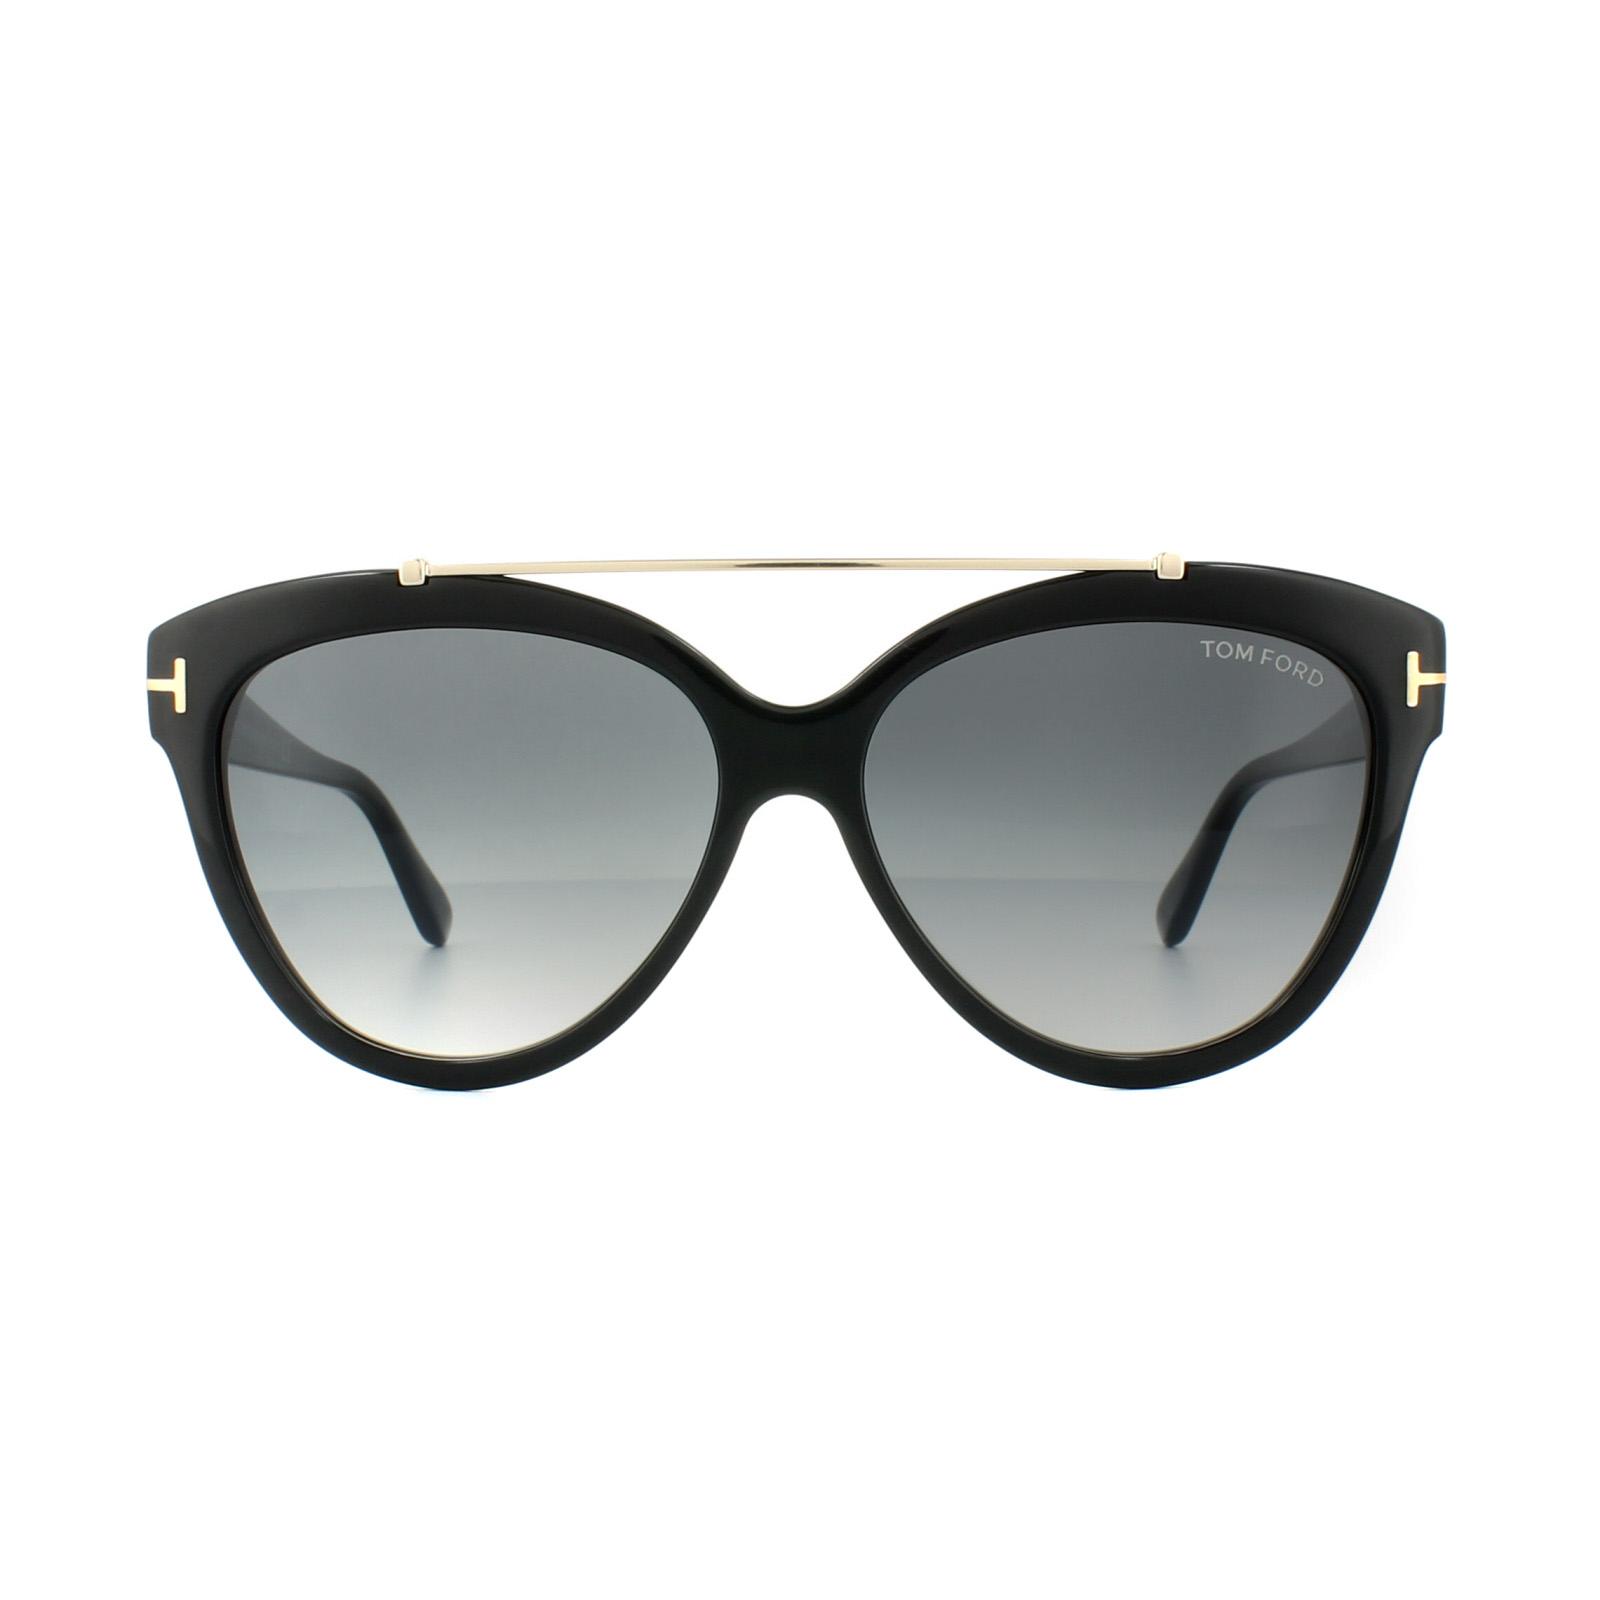 36c47aacfc7b Sentinel Tom Ford Sunglasses 0518 Livia 01B Shiny Black Grey Gradient